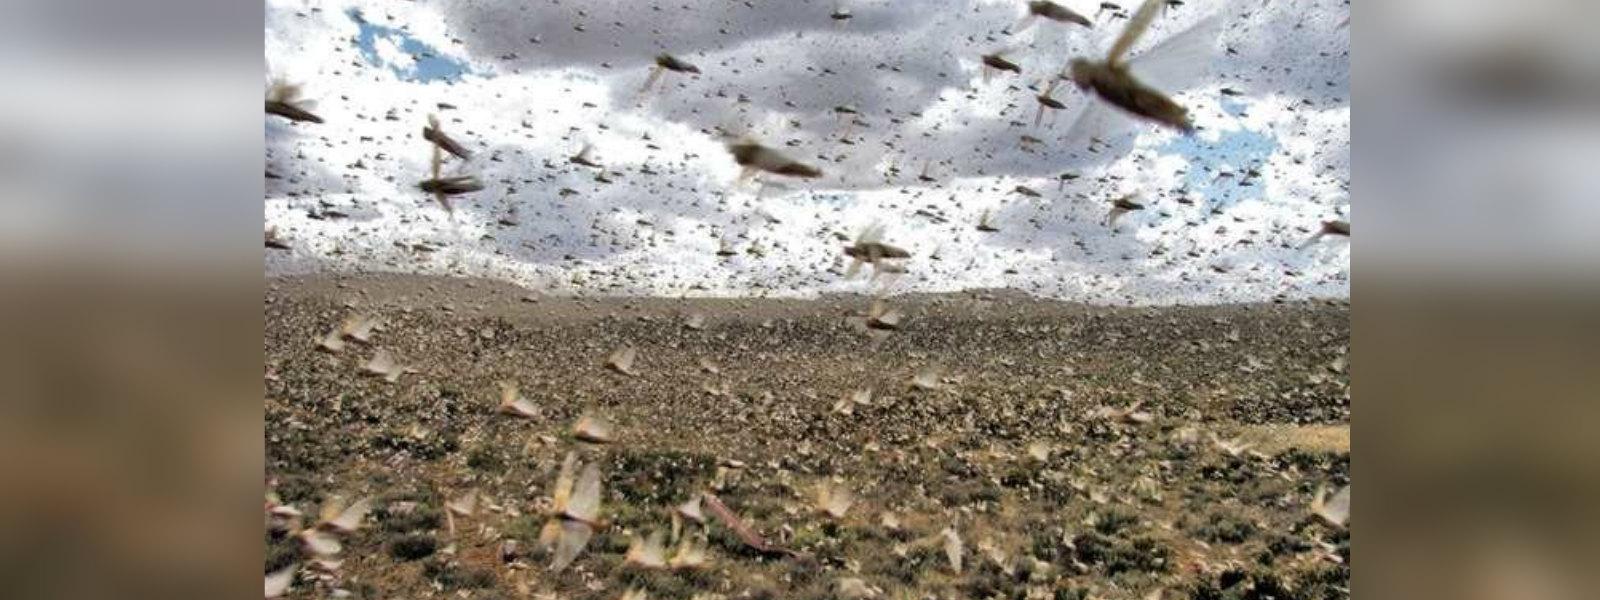 Sri Lanka at risk if overseas desert locust plague persists